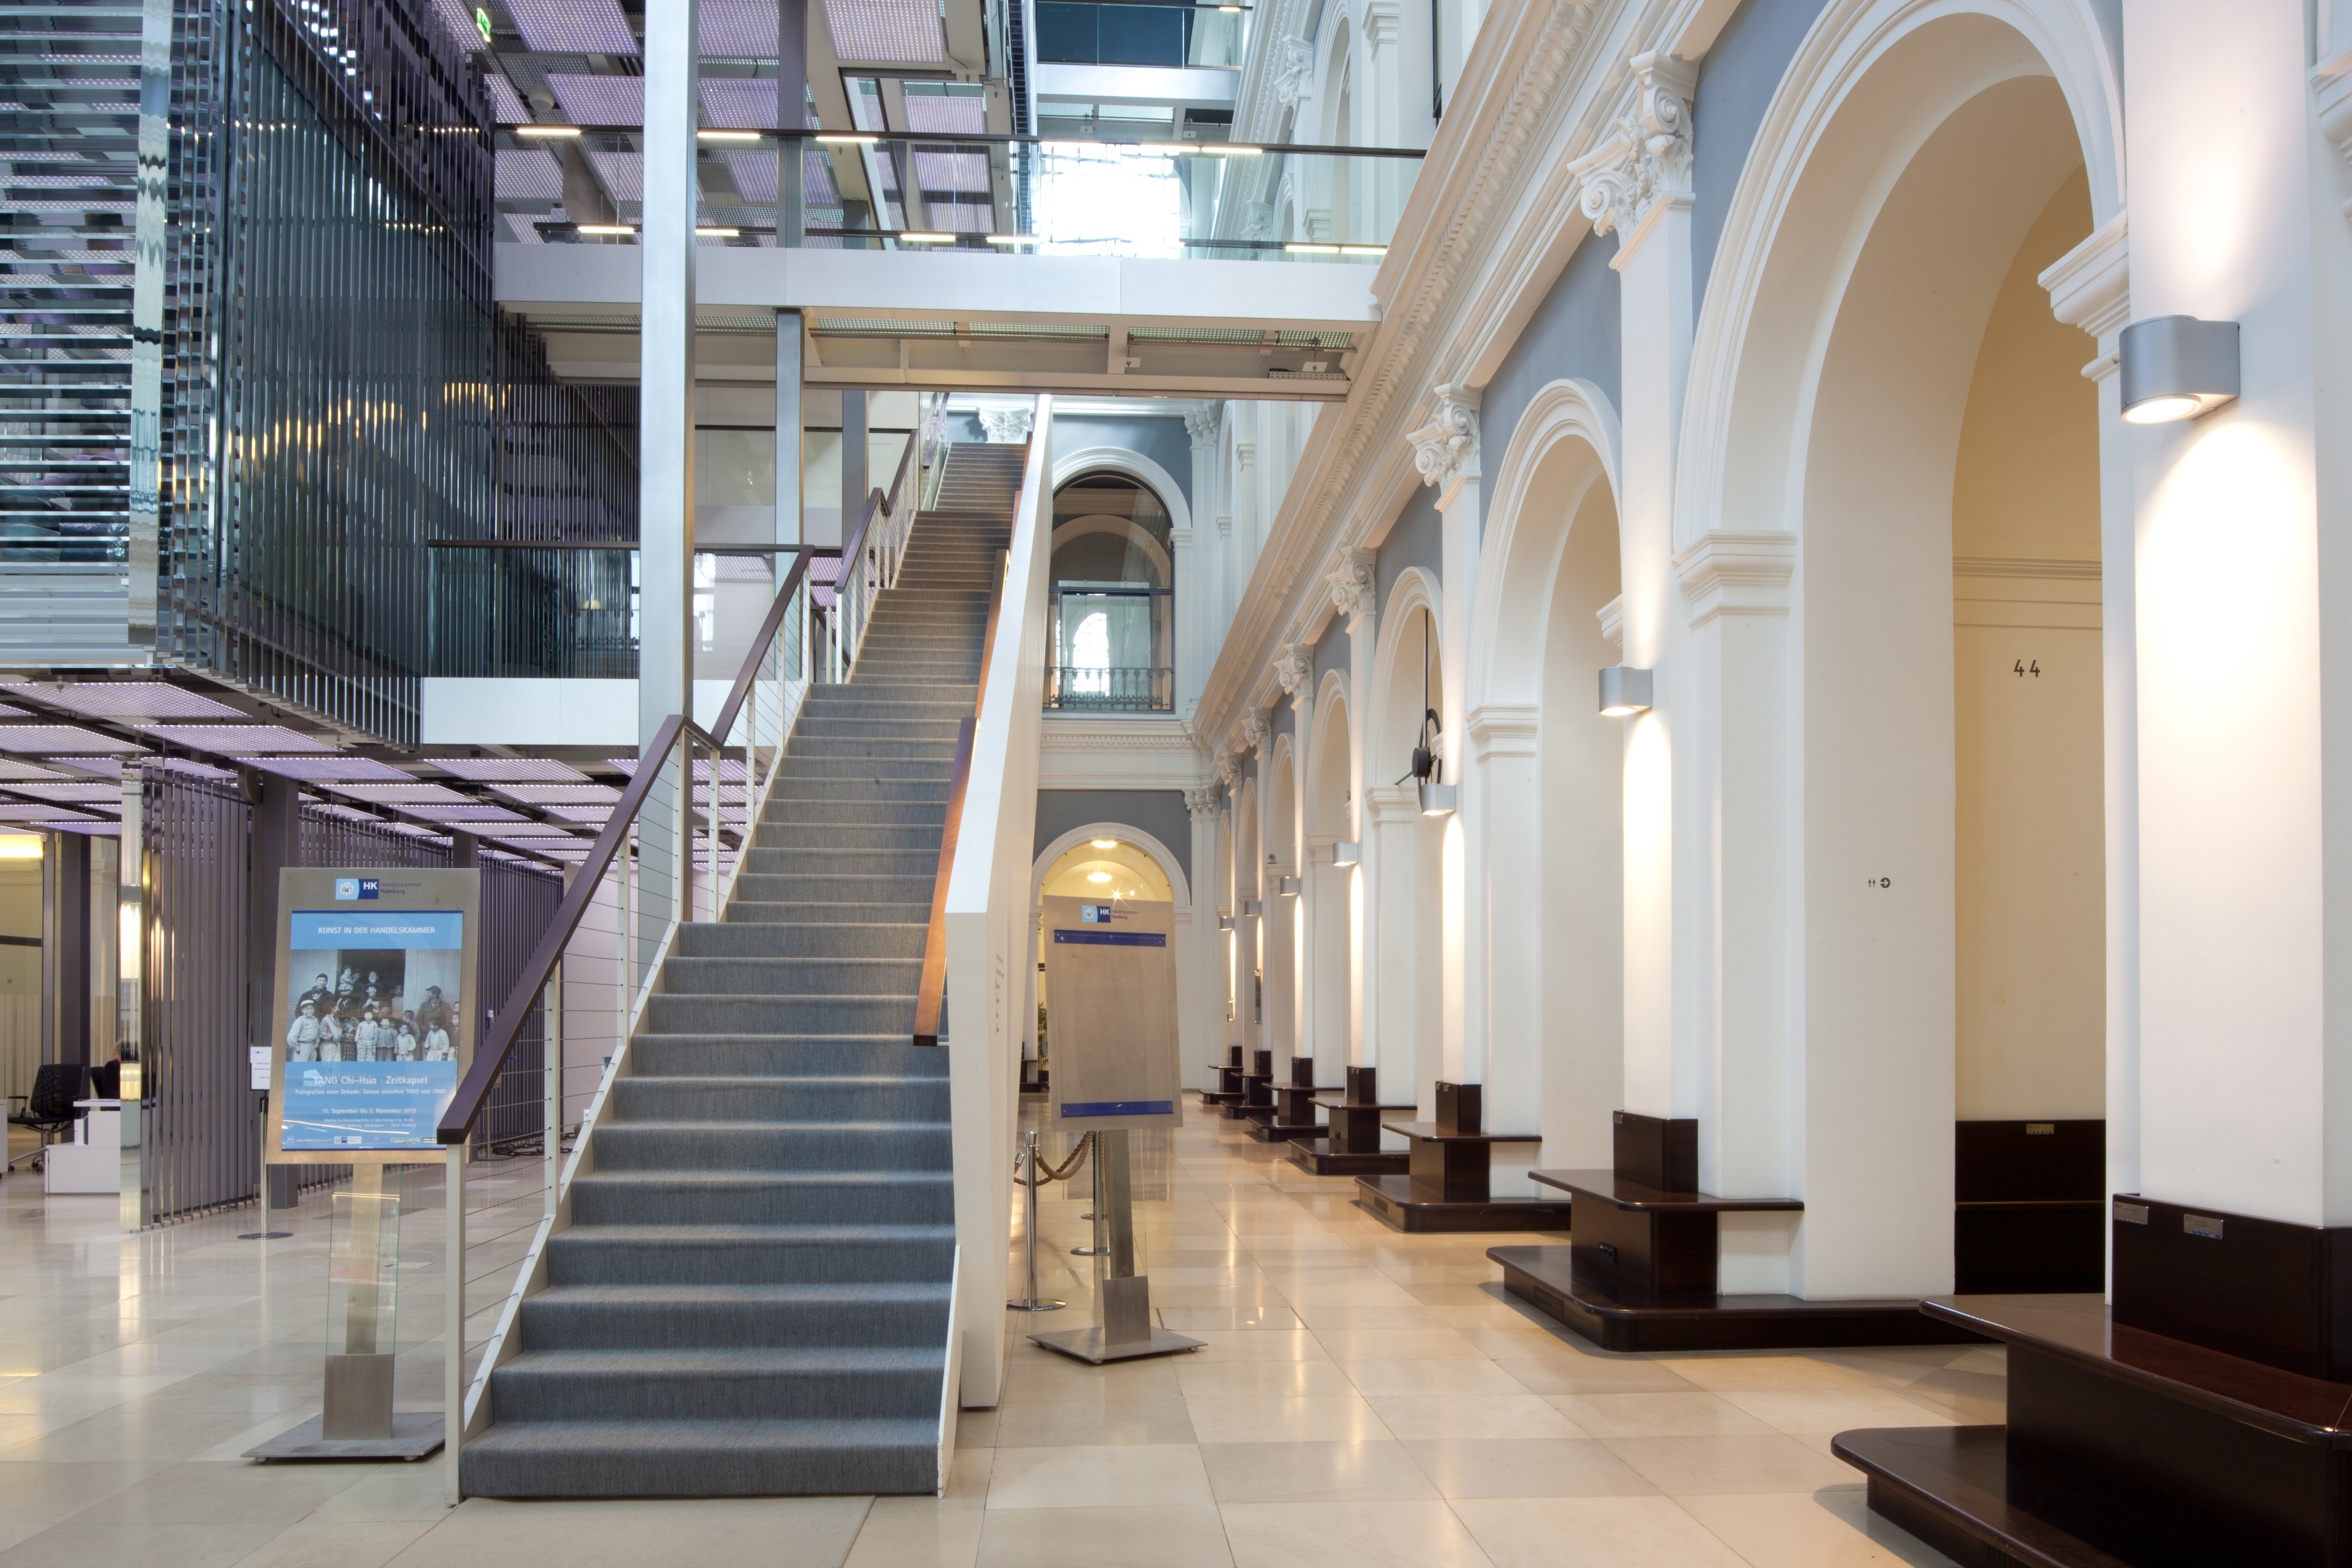 Handelskammer Commerzbibliothek Treppenaufgang